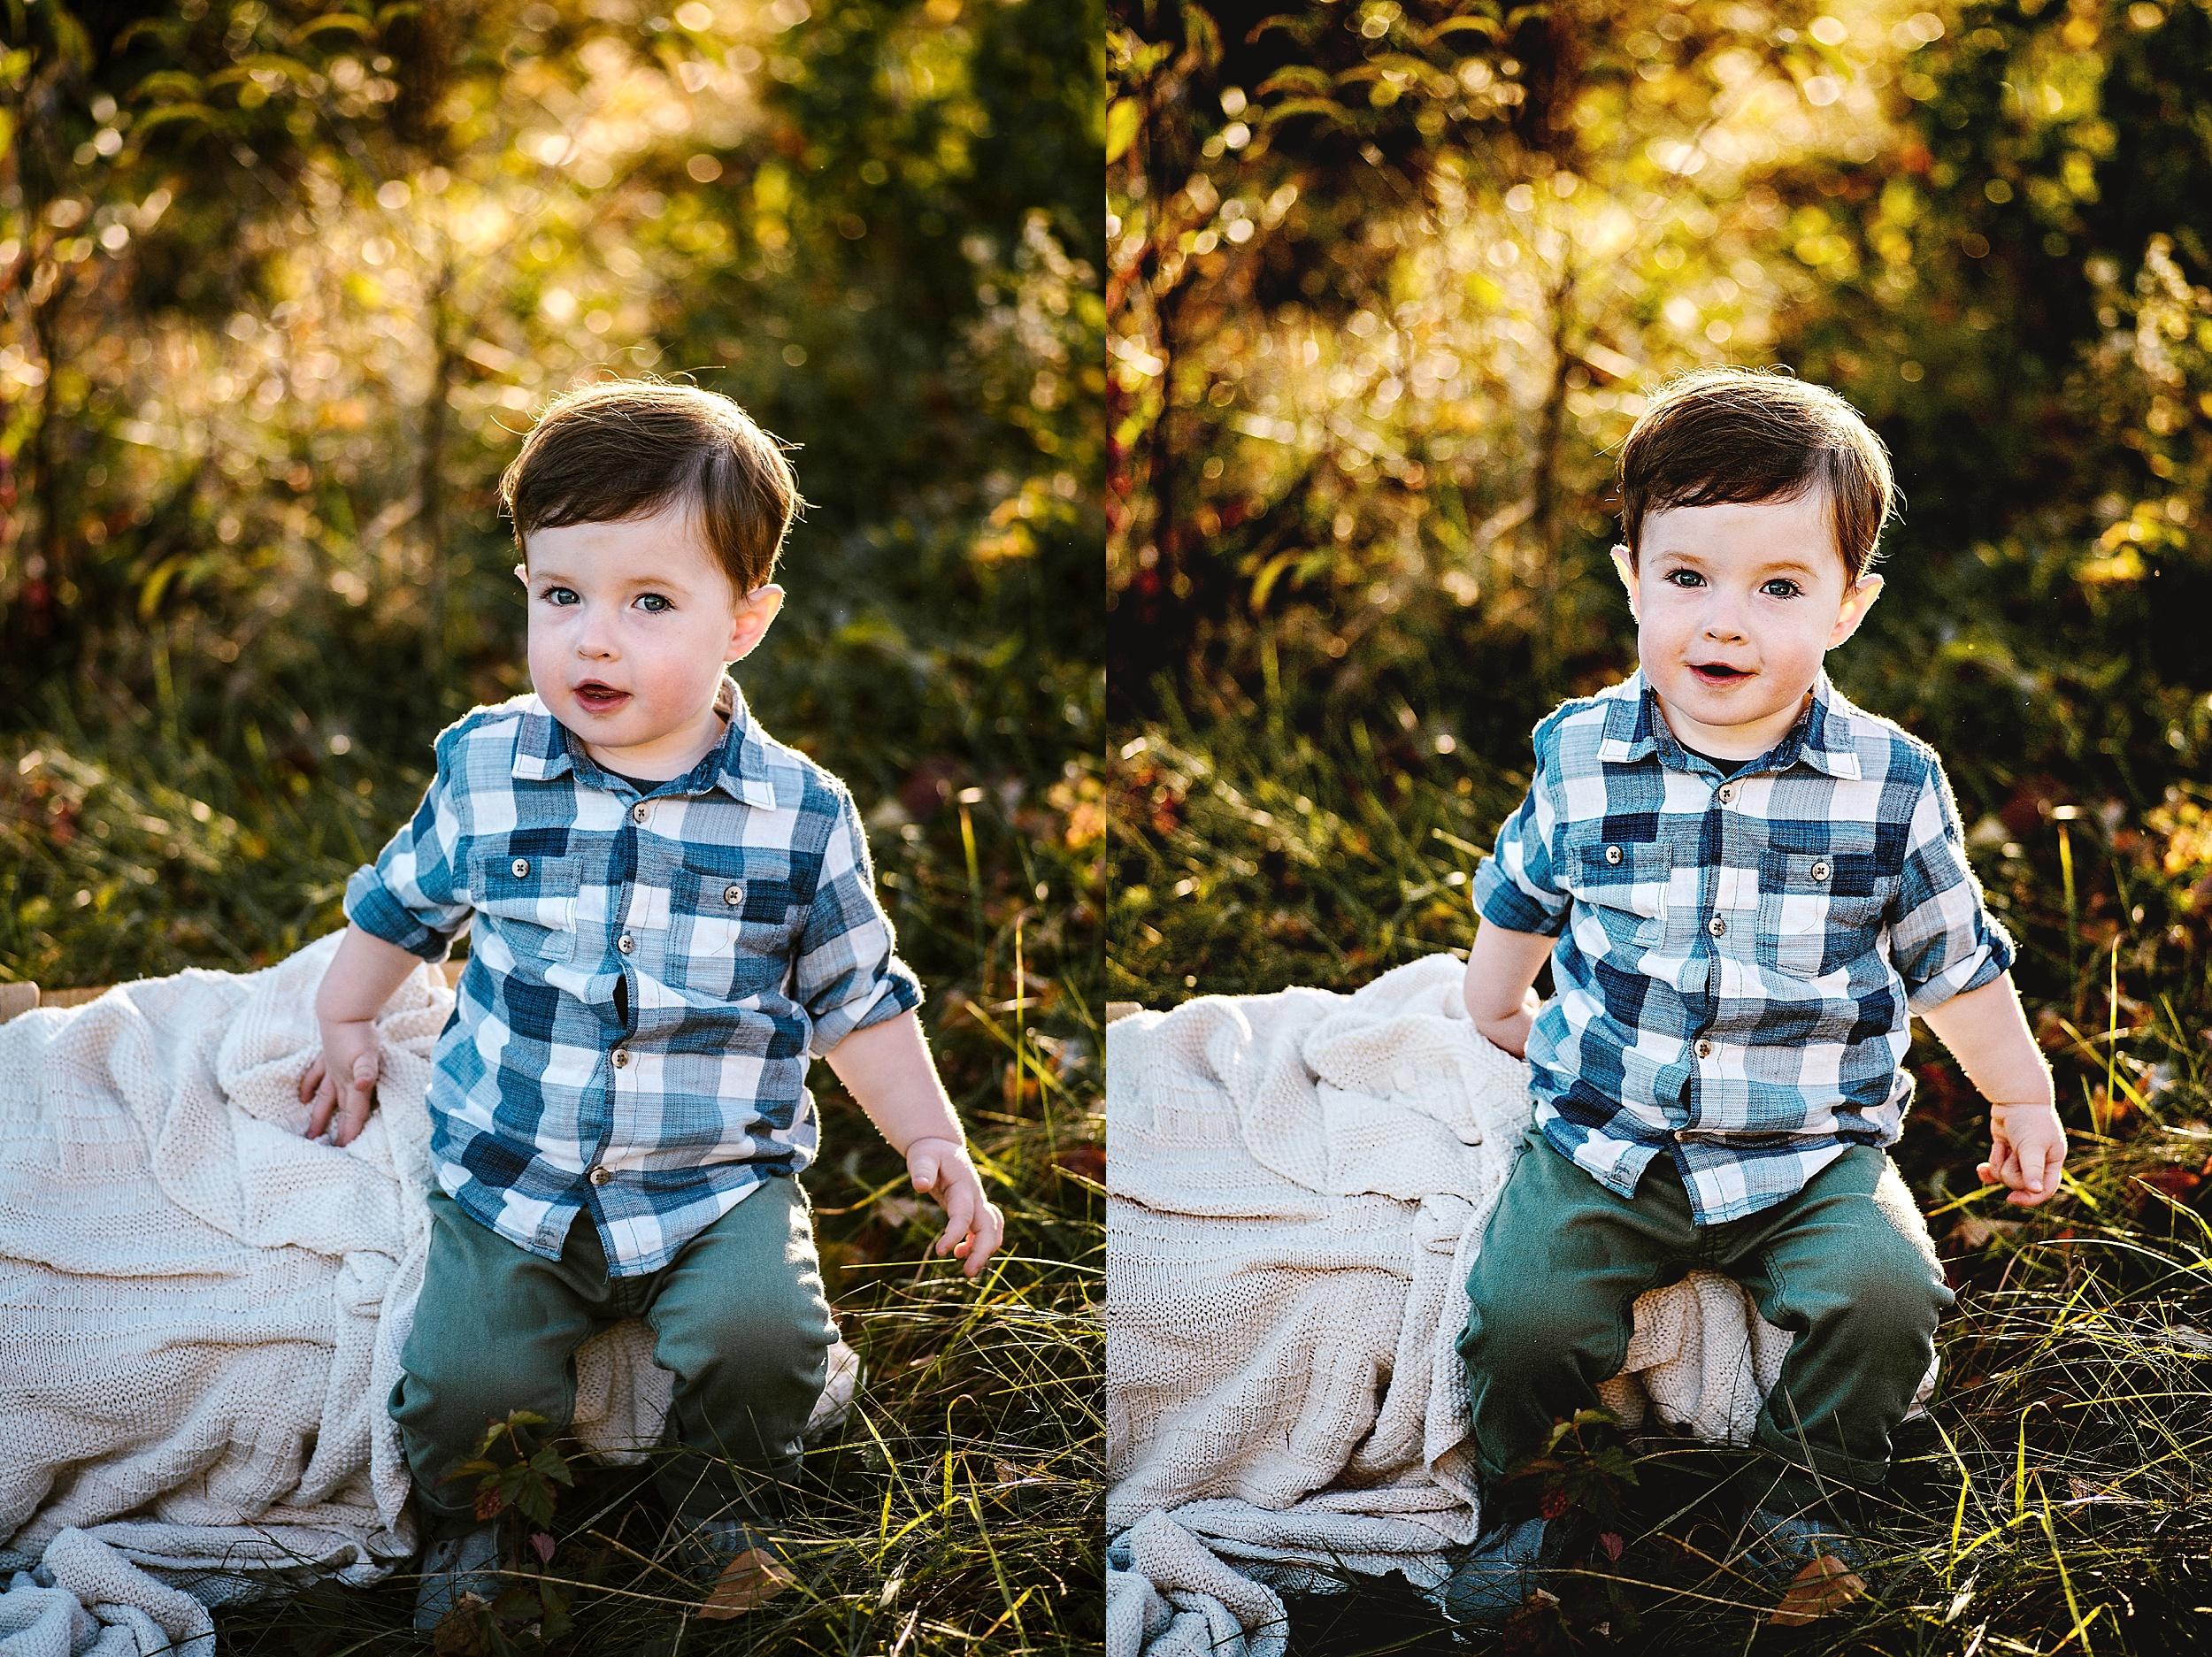 lauren-grayson-photography-portrait-artist-akron-cleveland-ohio-photographer-family-session-fields-sunset-fall_0171.jpg